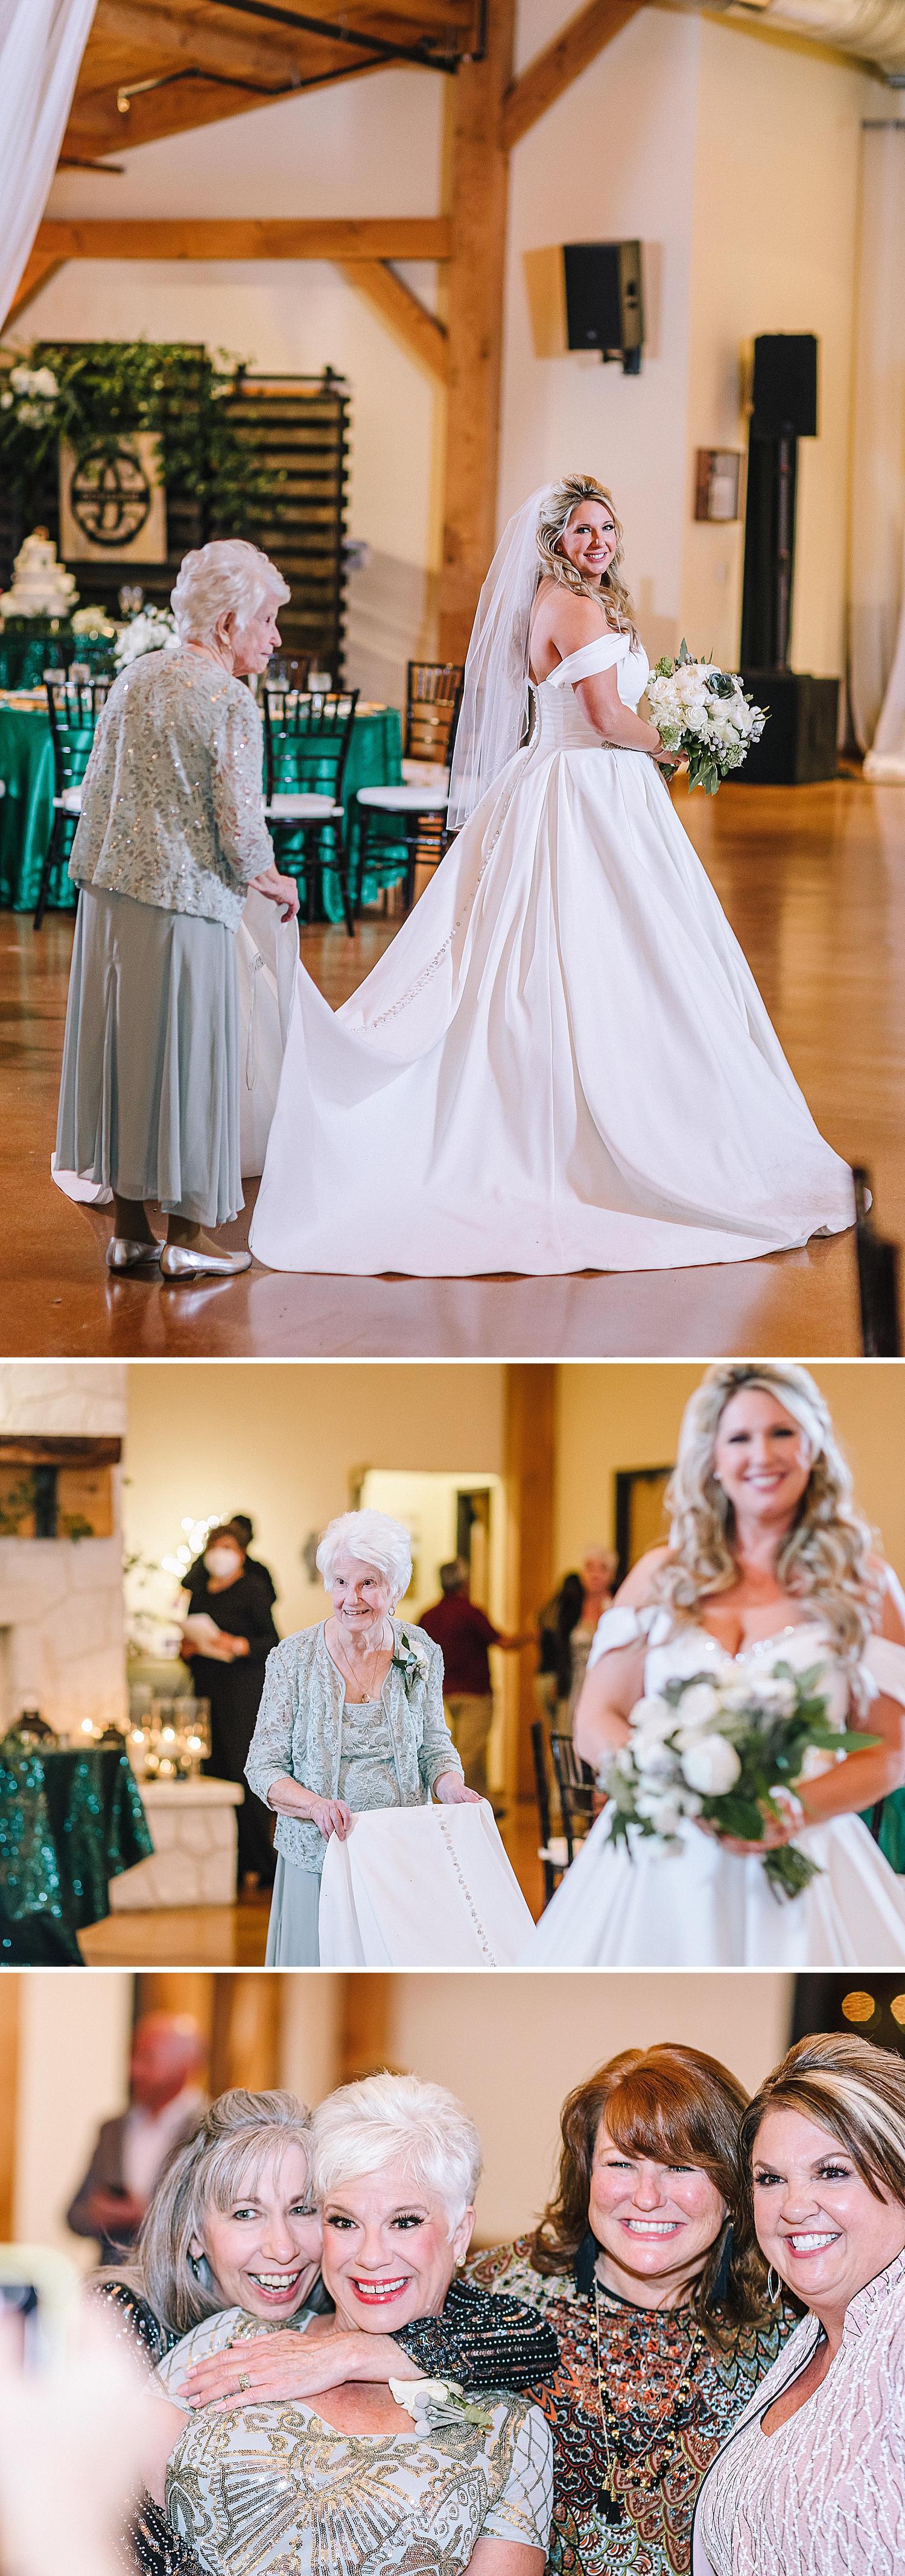 Magnolia-Halle-Wedding-San-Antonio-Texas-Bride-Grom_0093.jpg